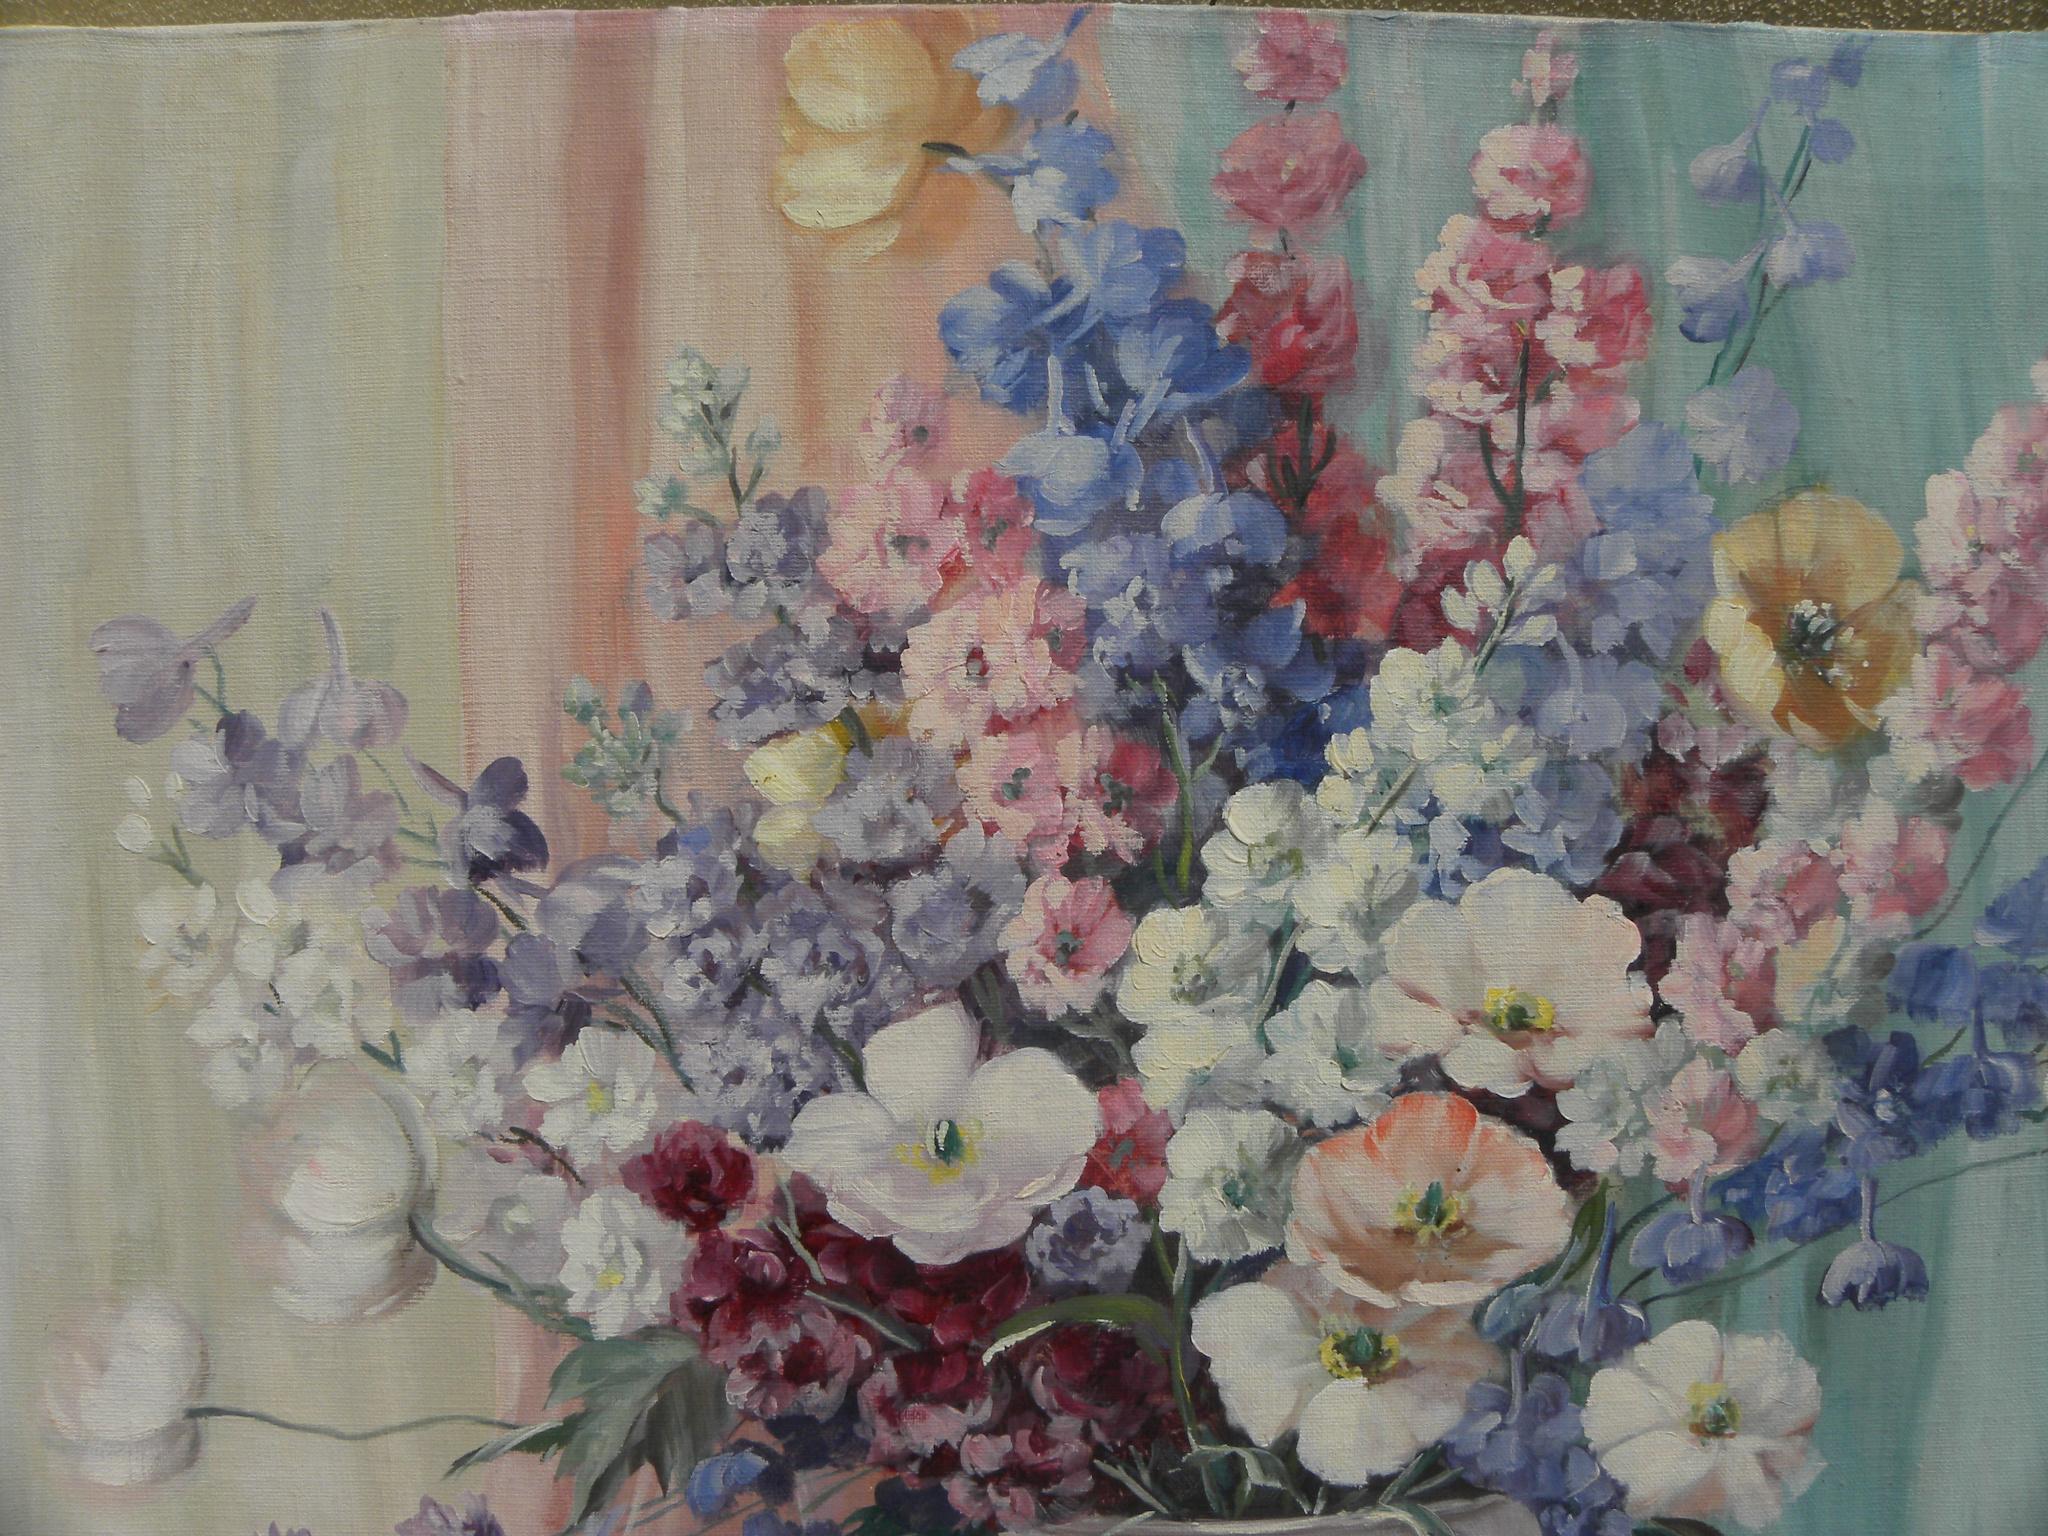 Circa 1940s American Impressionist Still Life Painting